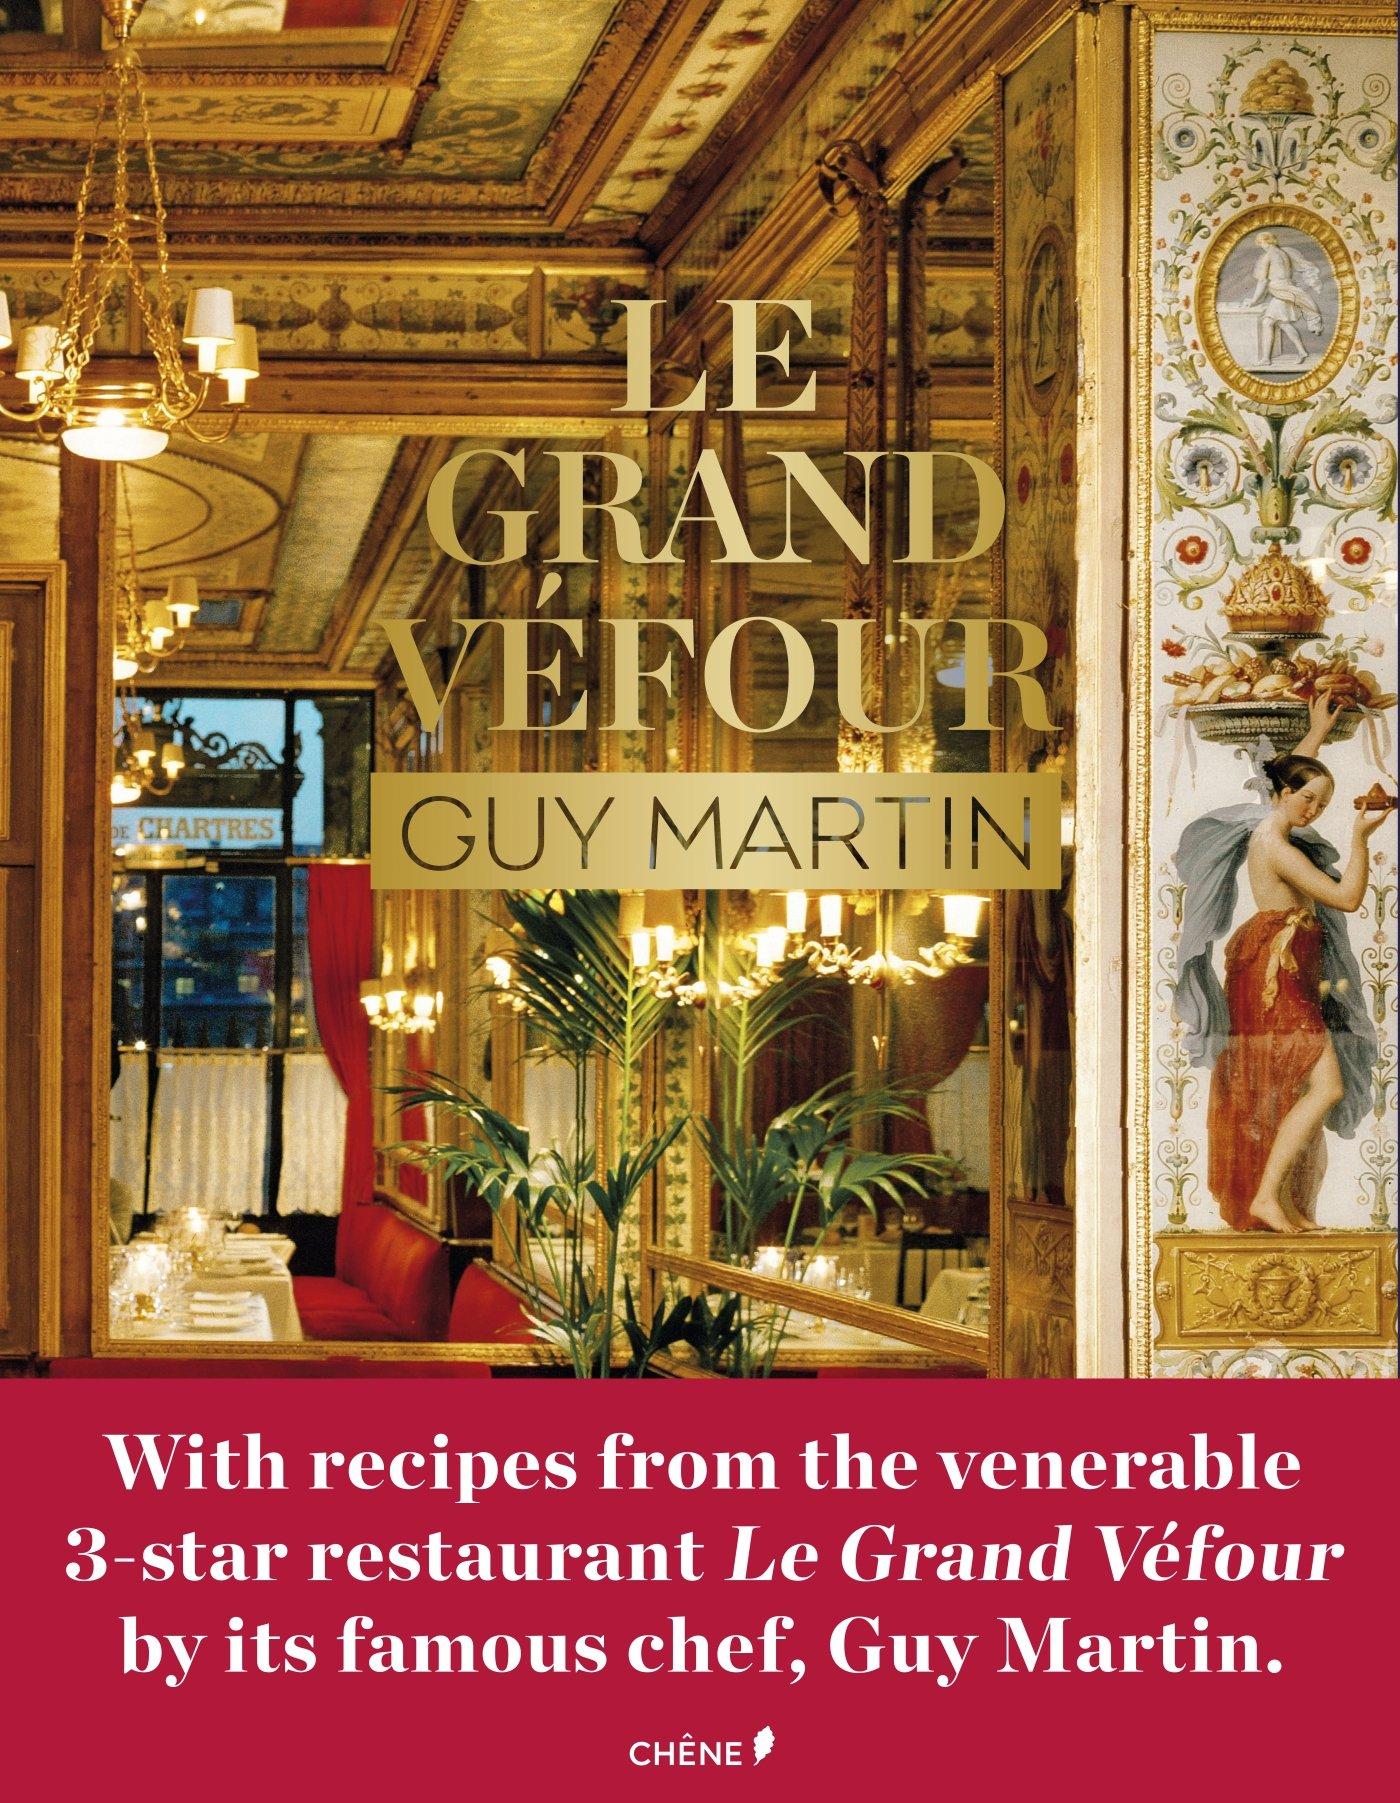 Le Grand Véfour: Guy Martin (Chene Cuis.Vin) pdf epub